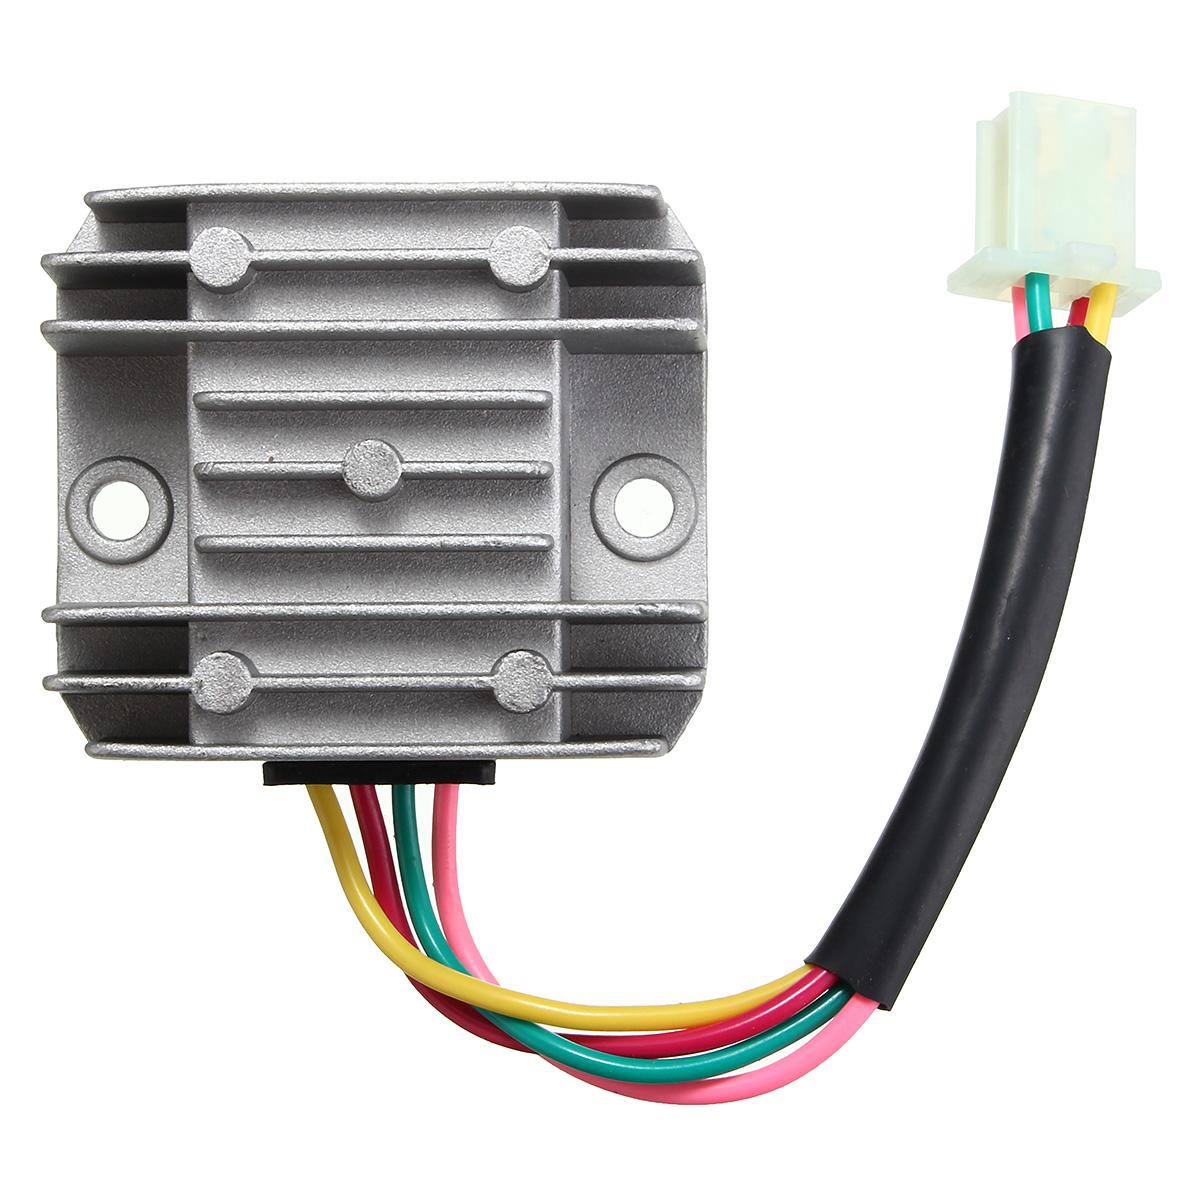 125cc 150cc 200cc 250cc Quad Electric CDI Coil Wire Harness Stator on